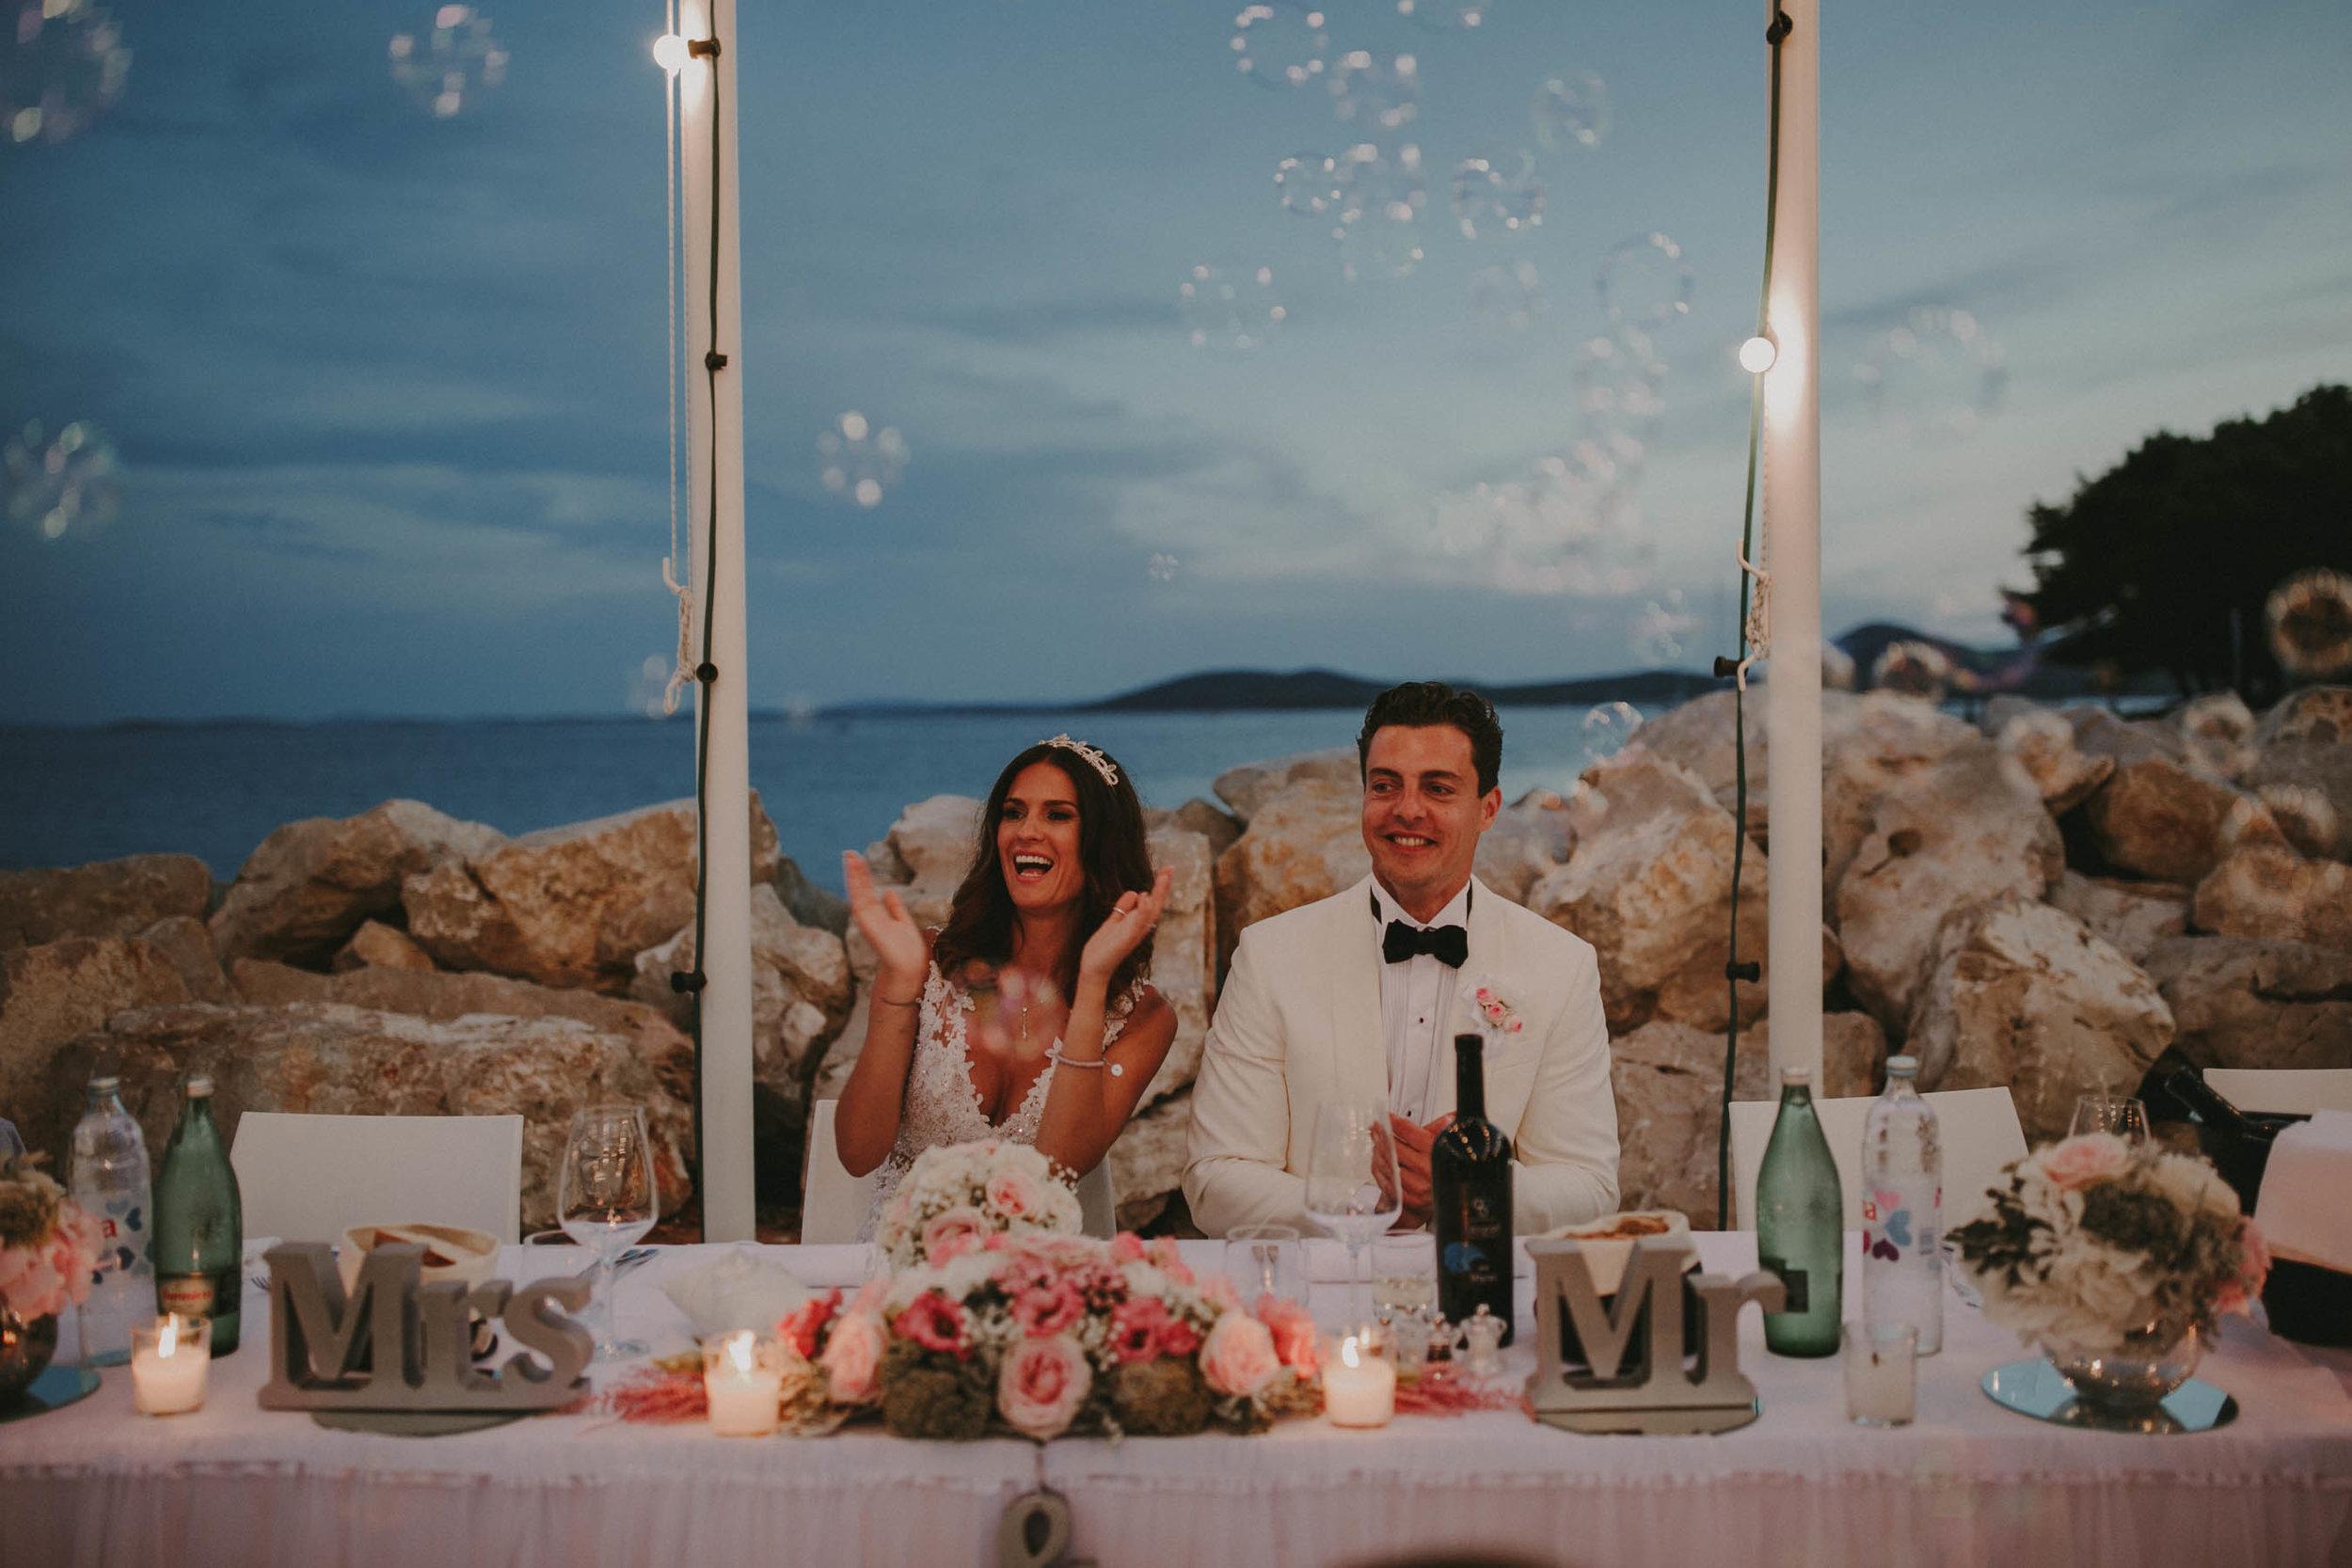 sylvia&dimitri-Wedding-Crvena_Luka-Croatia-89(9147).jpg